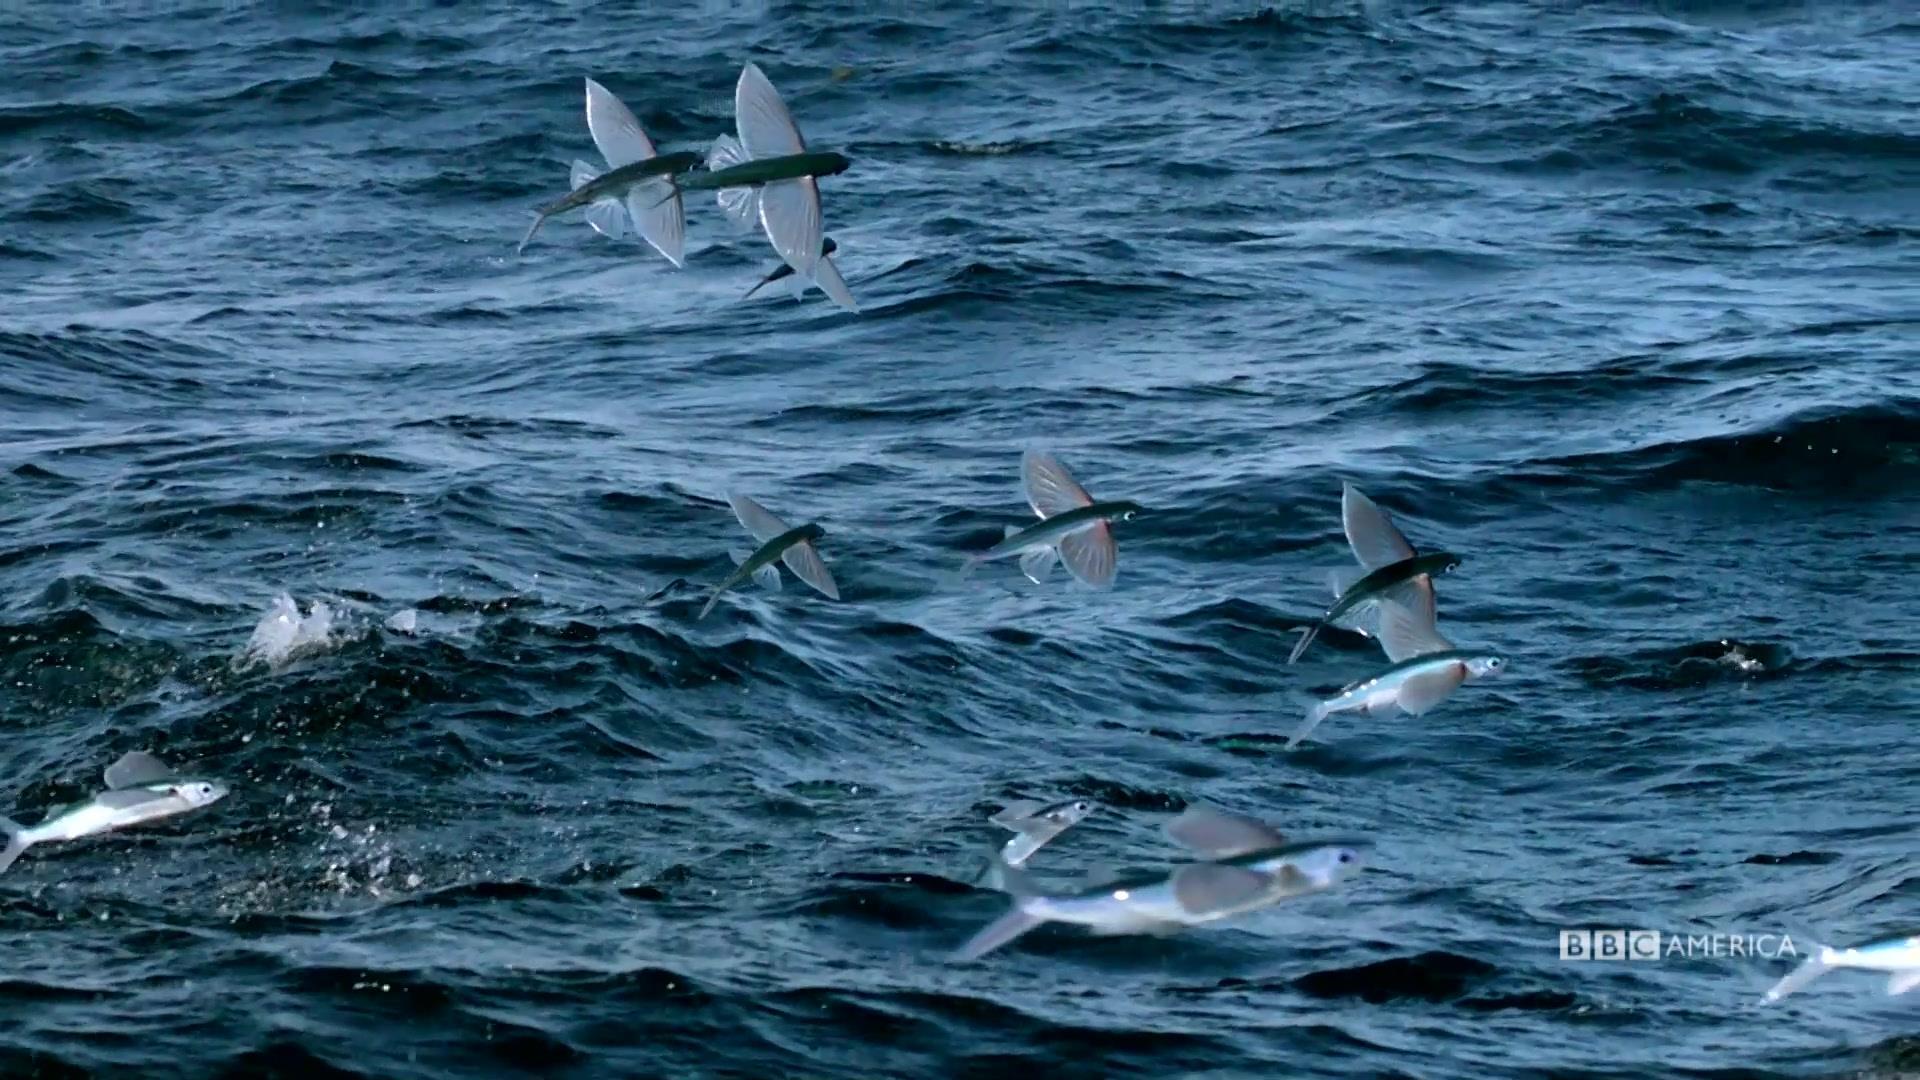 Sneak peek flying fish the hunt bbc america for Where do flying fish live